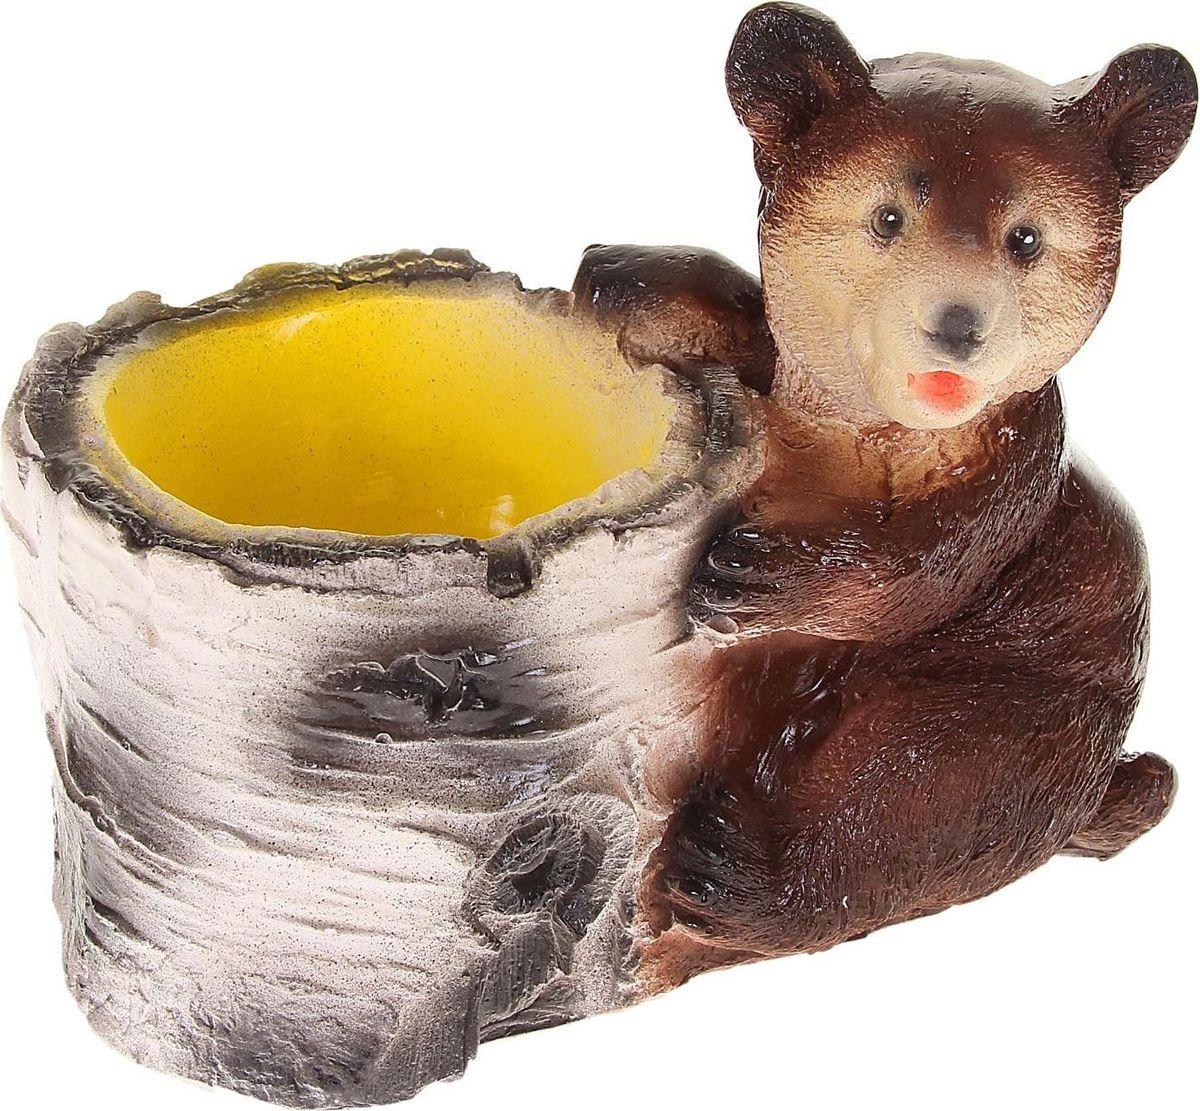 Кашпо Медведь с пеньком, 12 х 15 х 17 см1065386